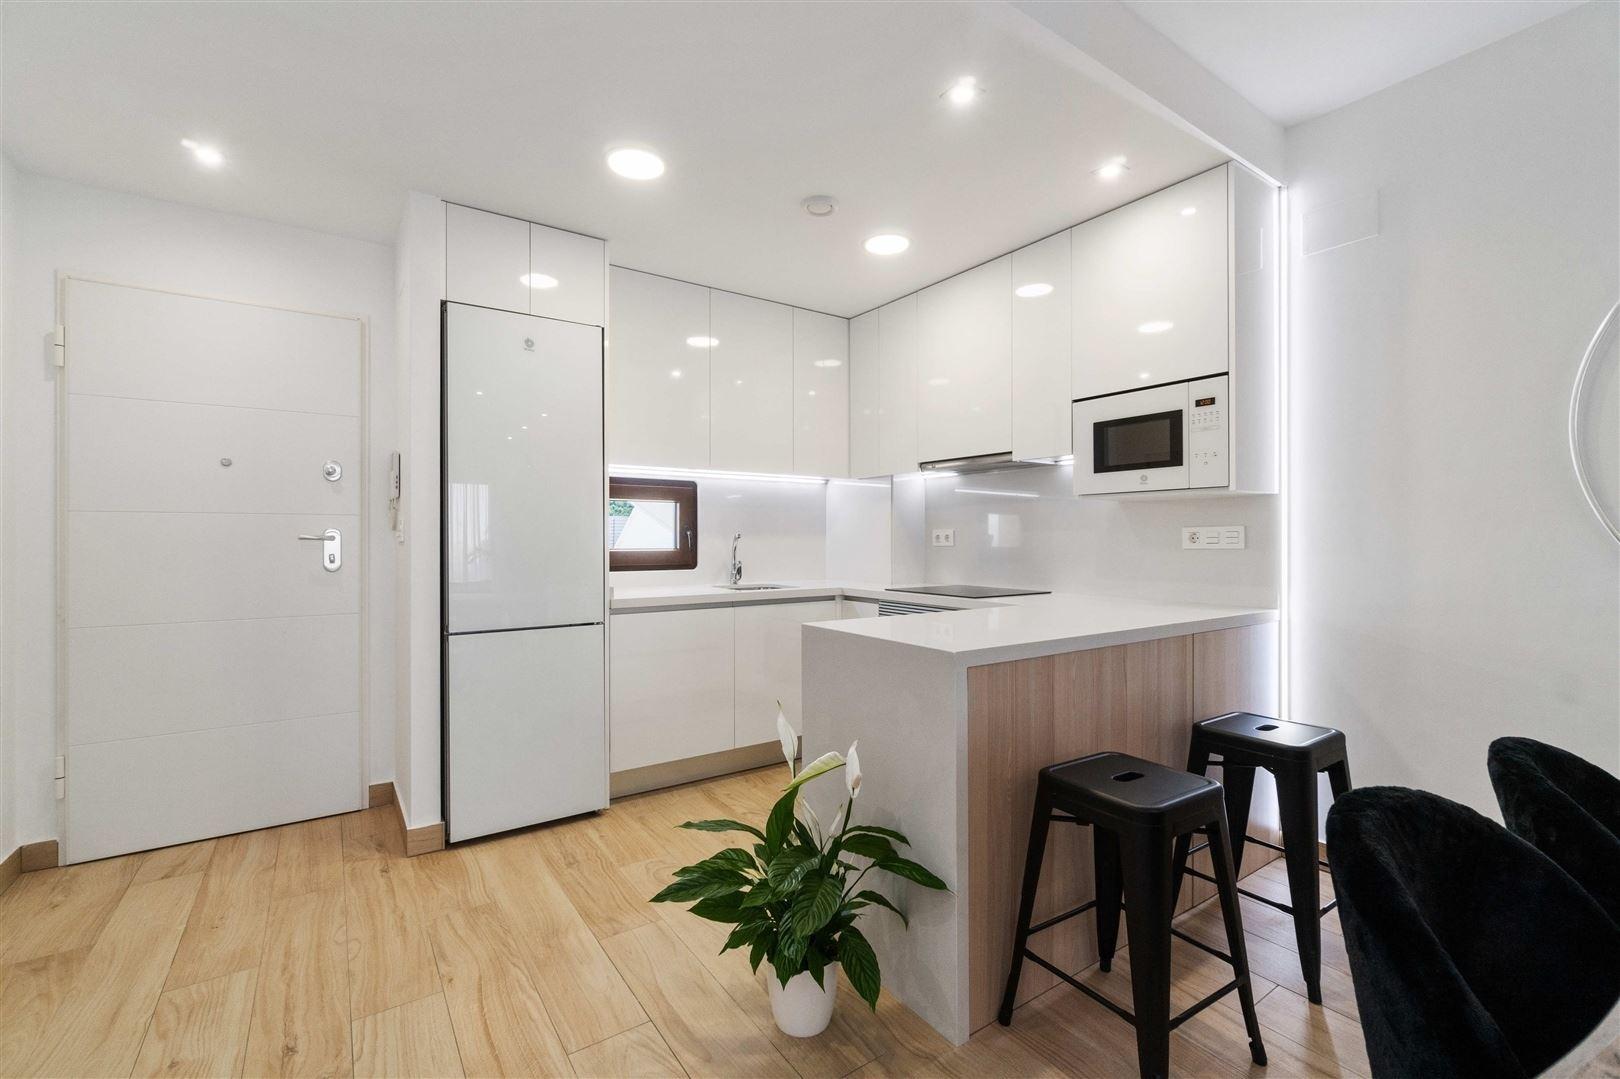 Foto 4 : Appartement te   (Spanje) - Prijs € 169.900